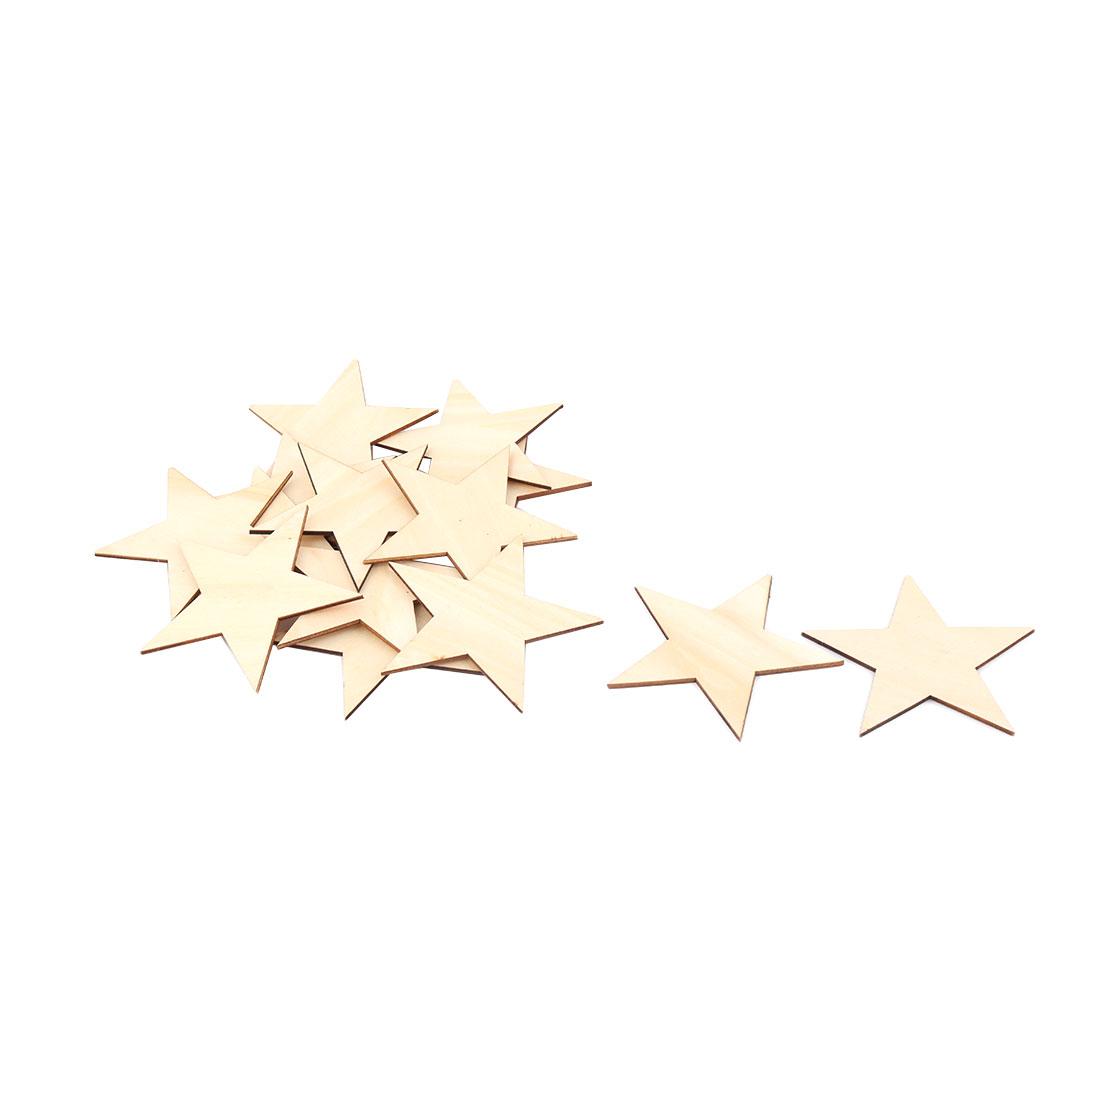 Wooden Star Shaped DIY Craft Christmas Tree Accessories Ornaments Beige 100 x 100mm 15pcs